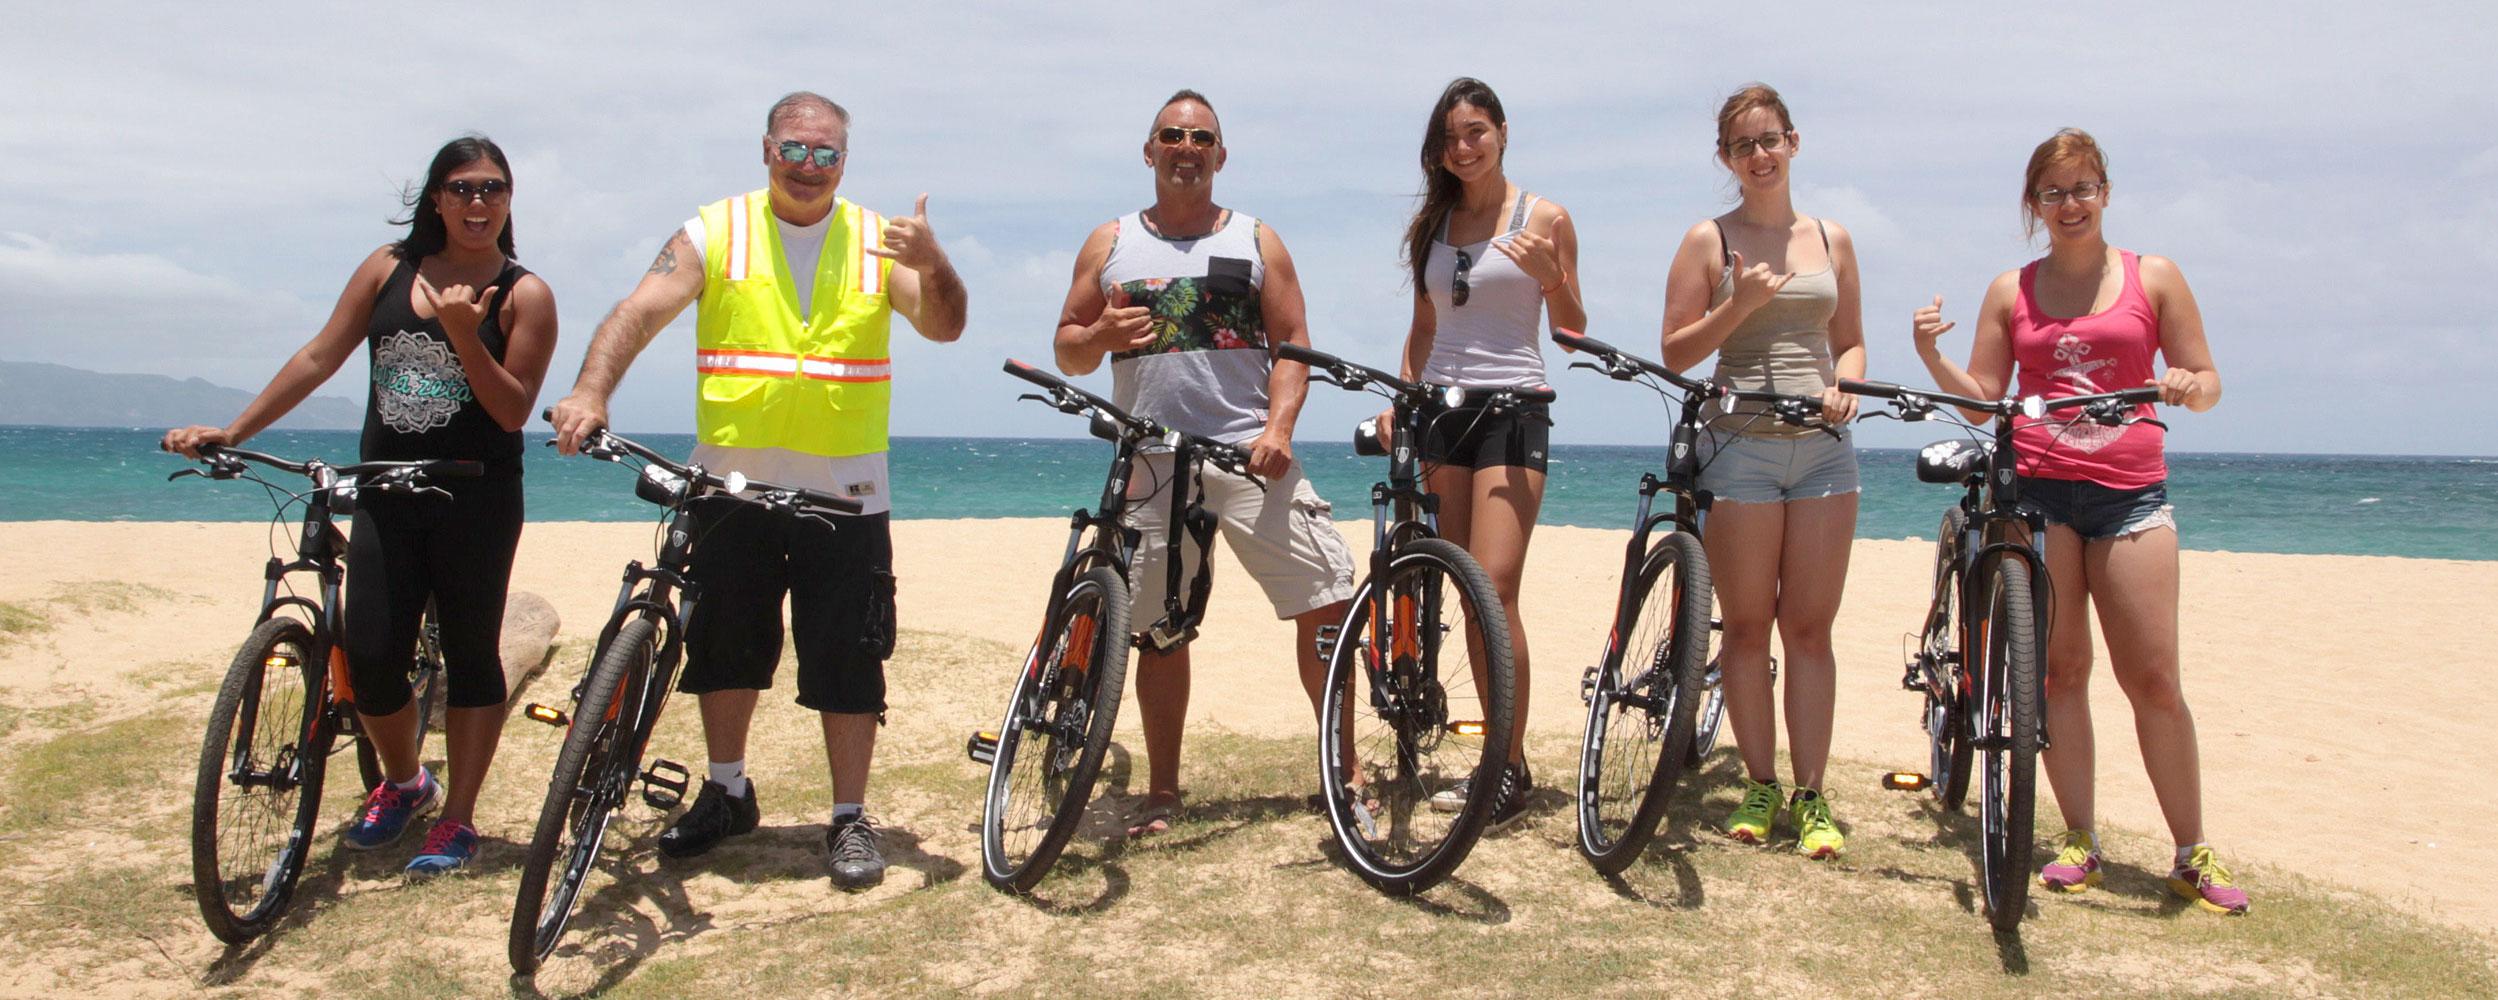 Maui Sunrise Bike Ride